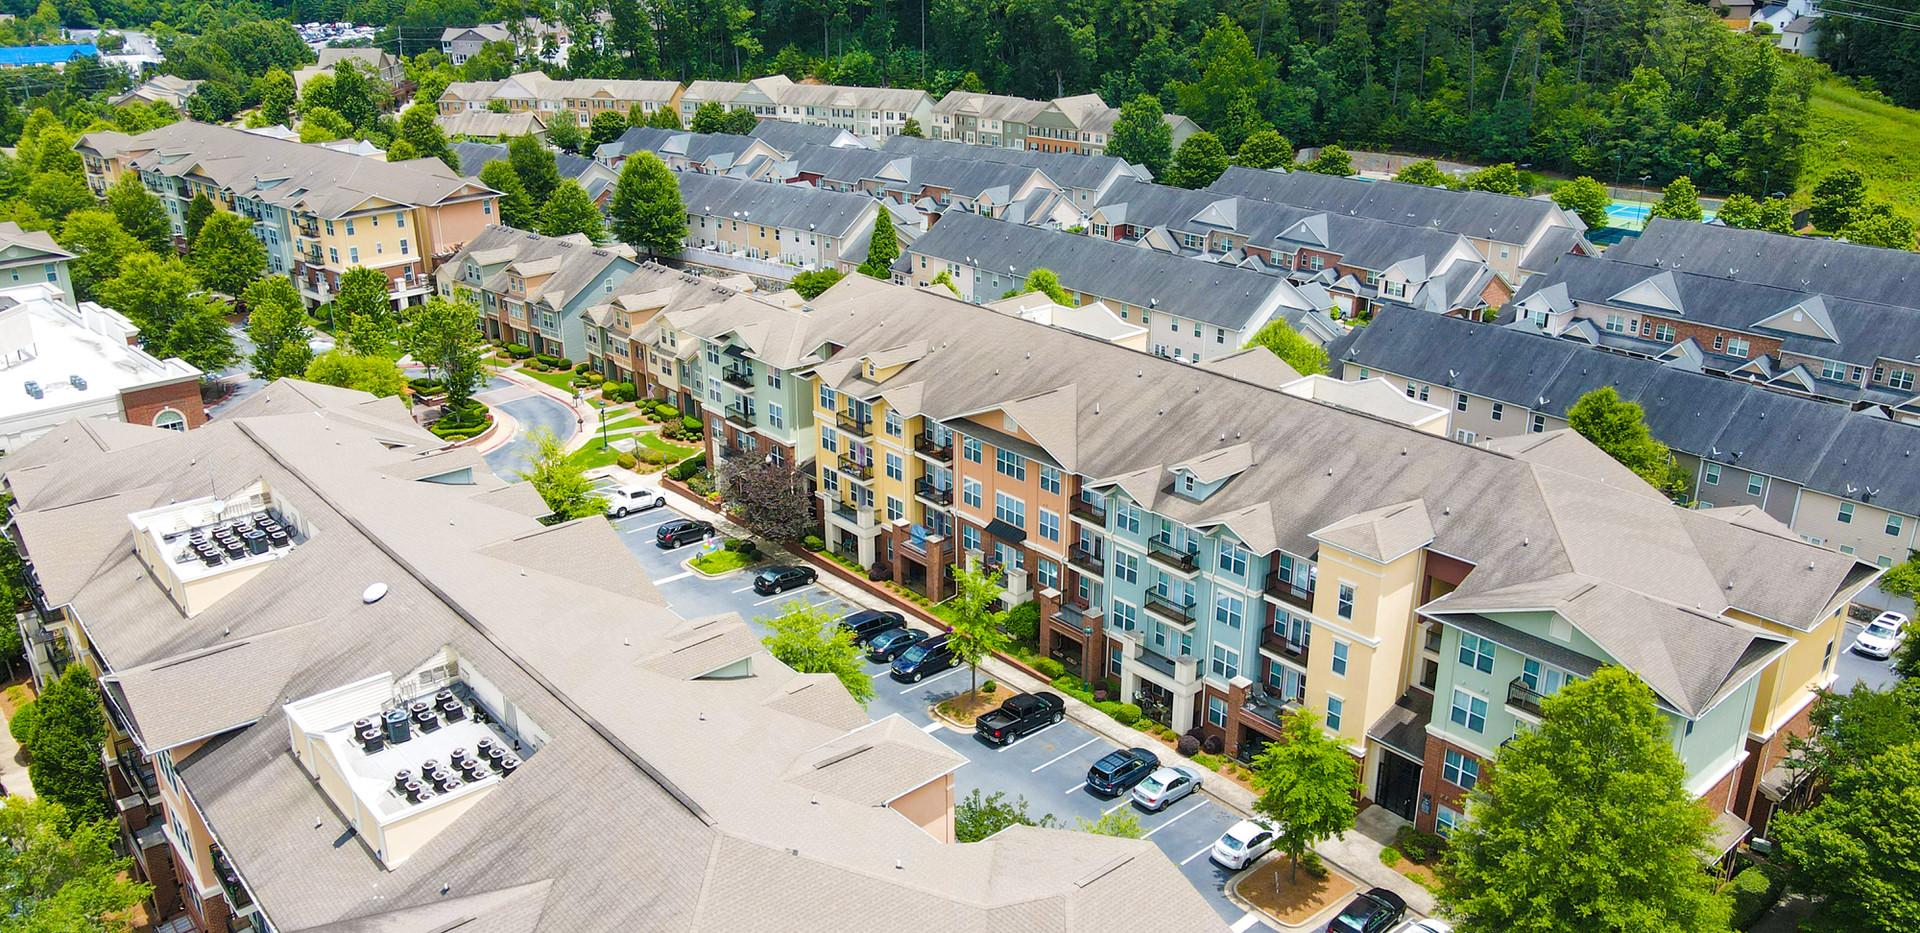 Aerial Building Photo